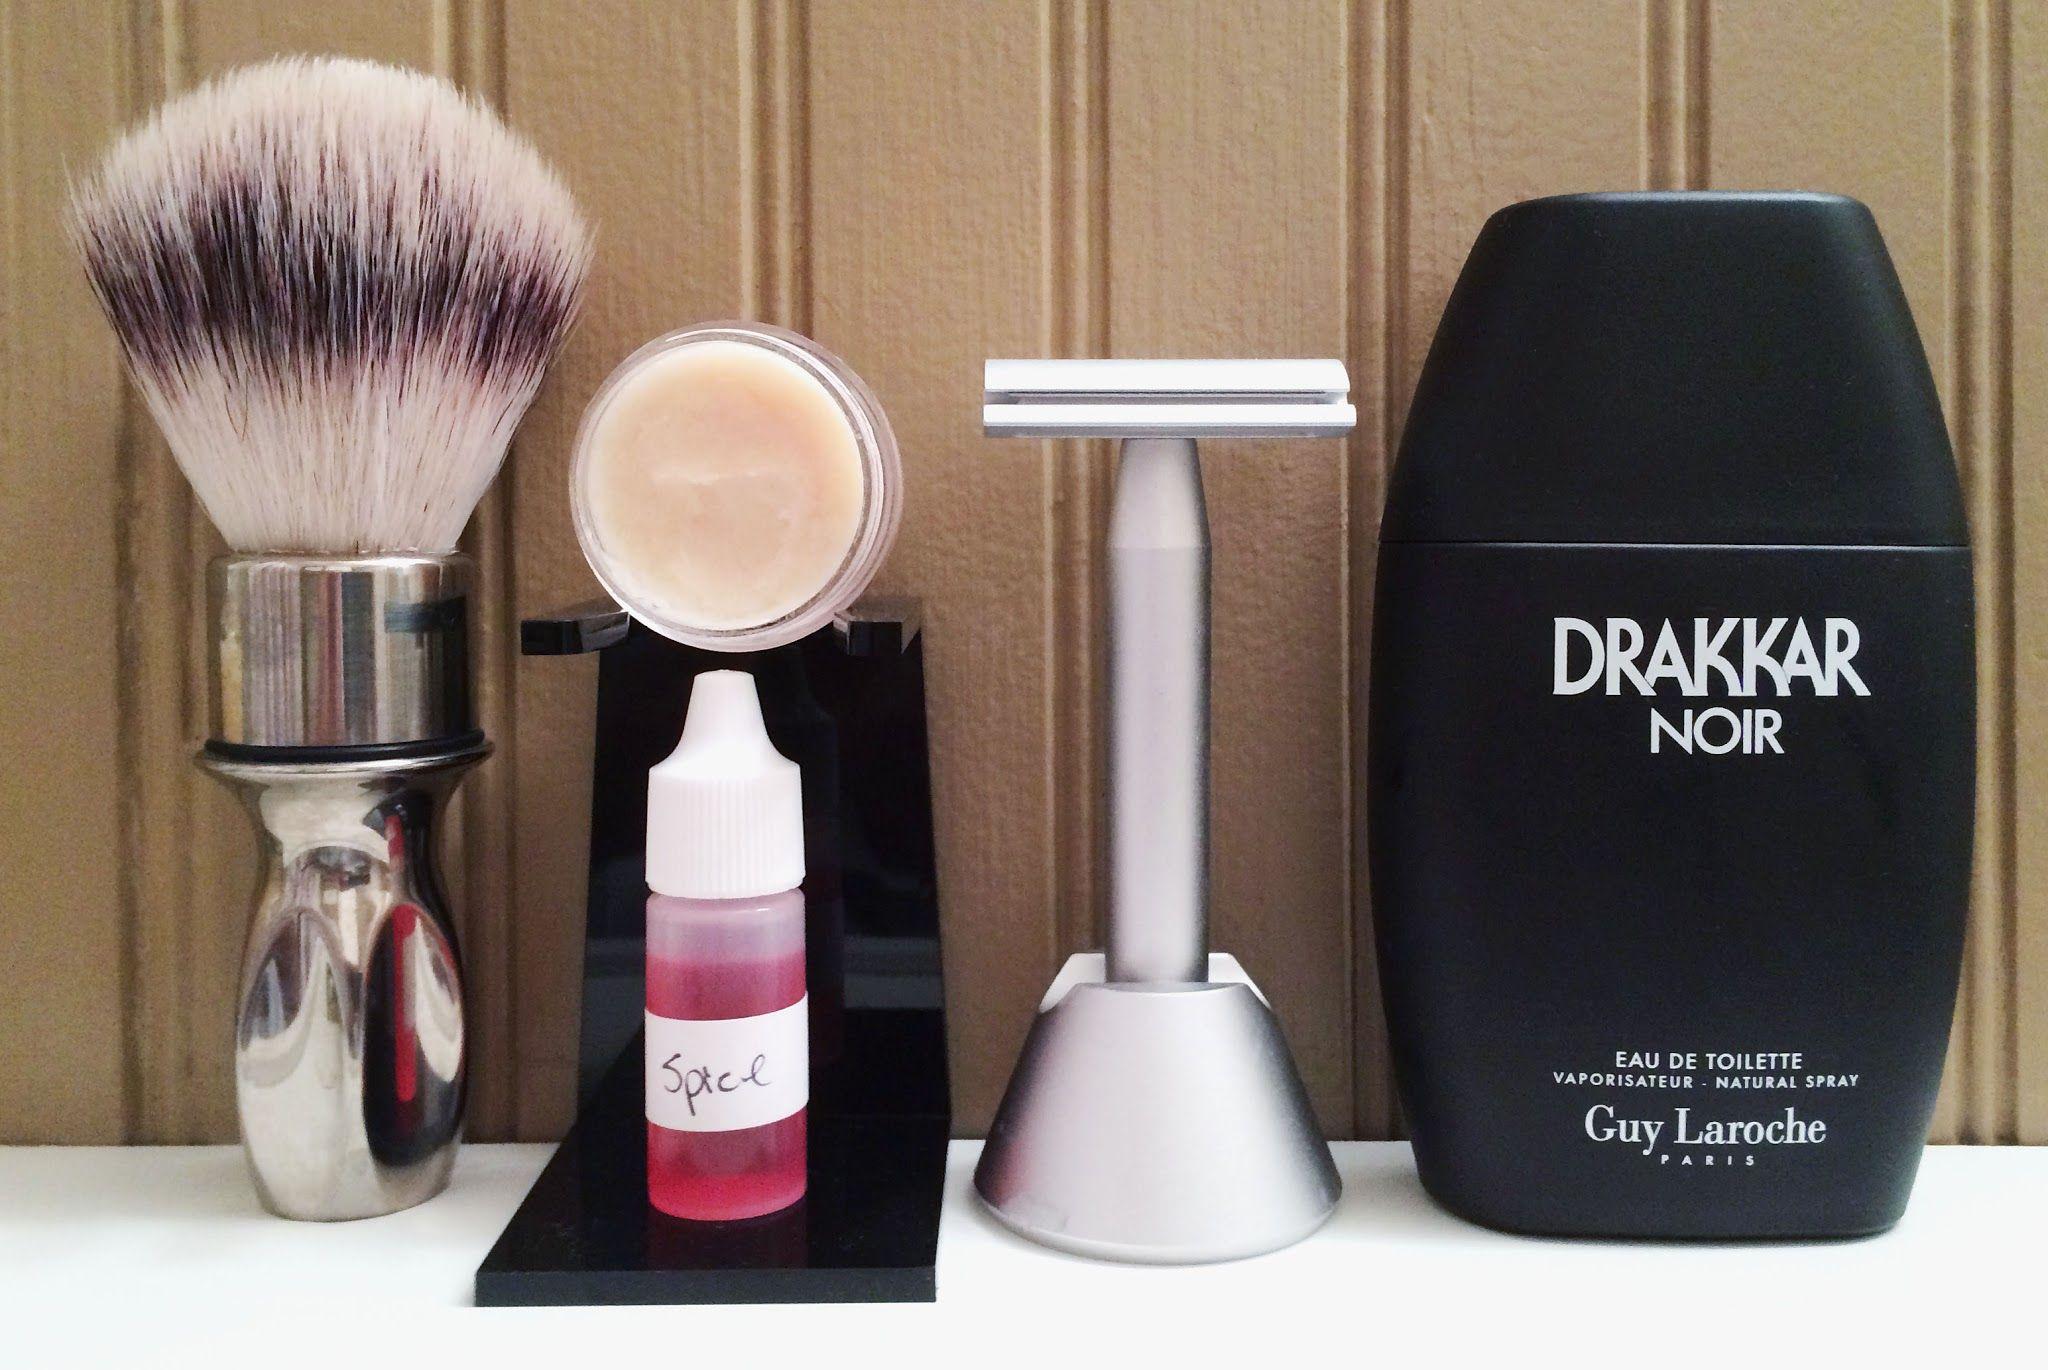 The Last Drakkar Tool